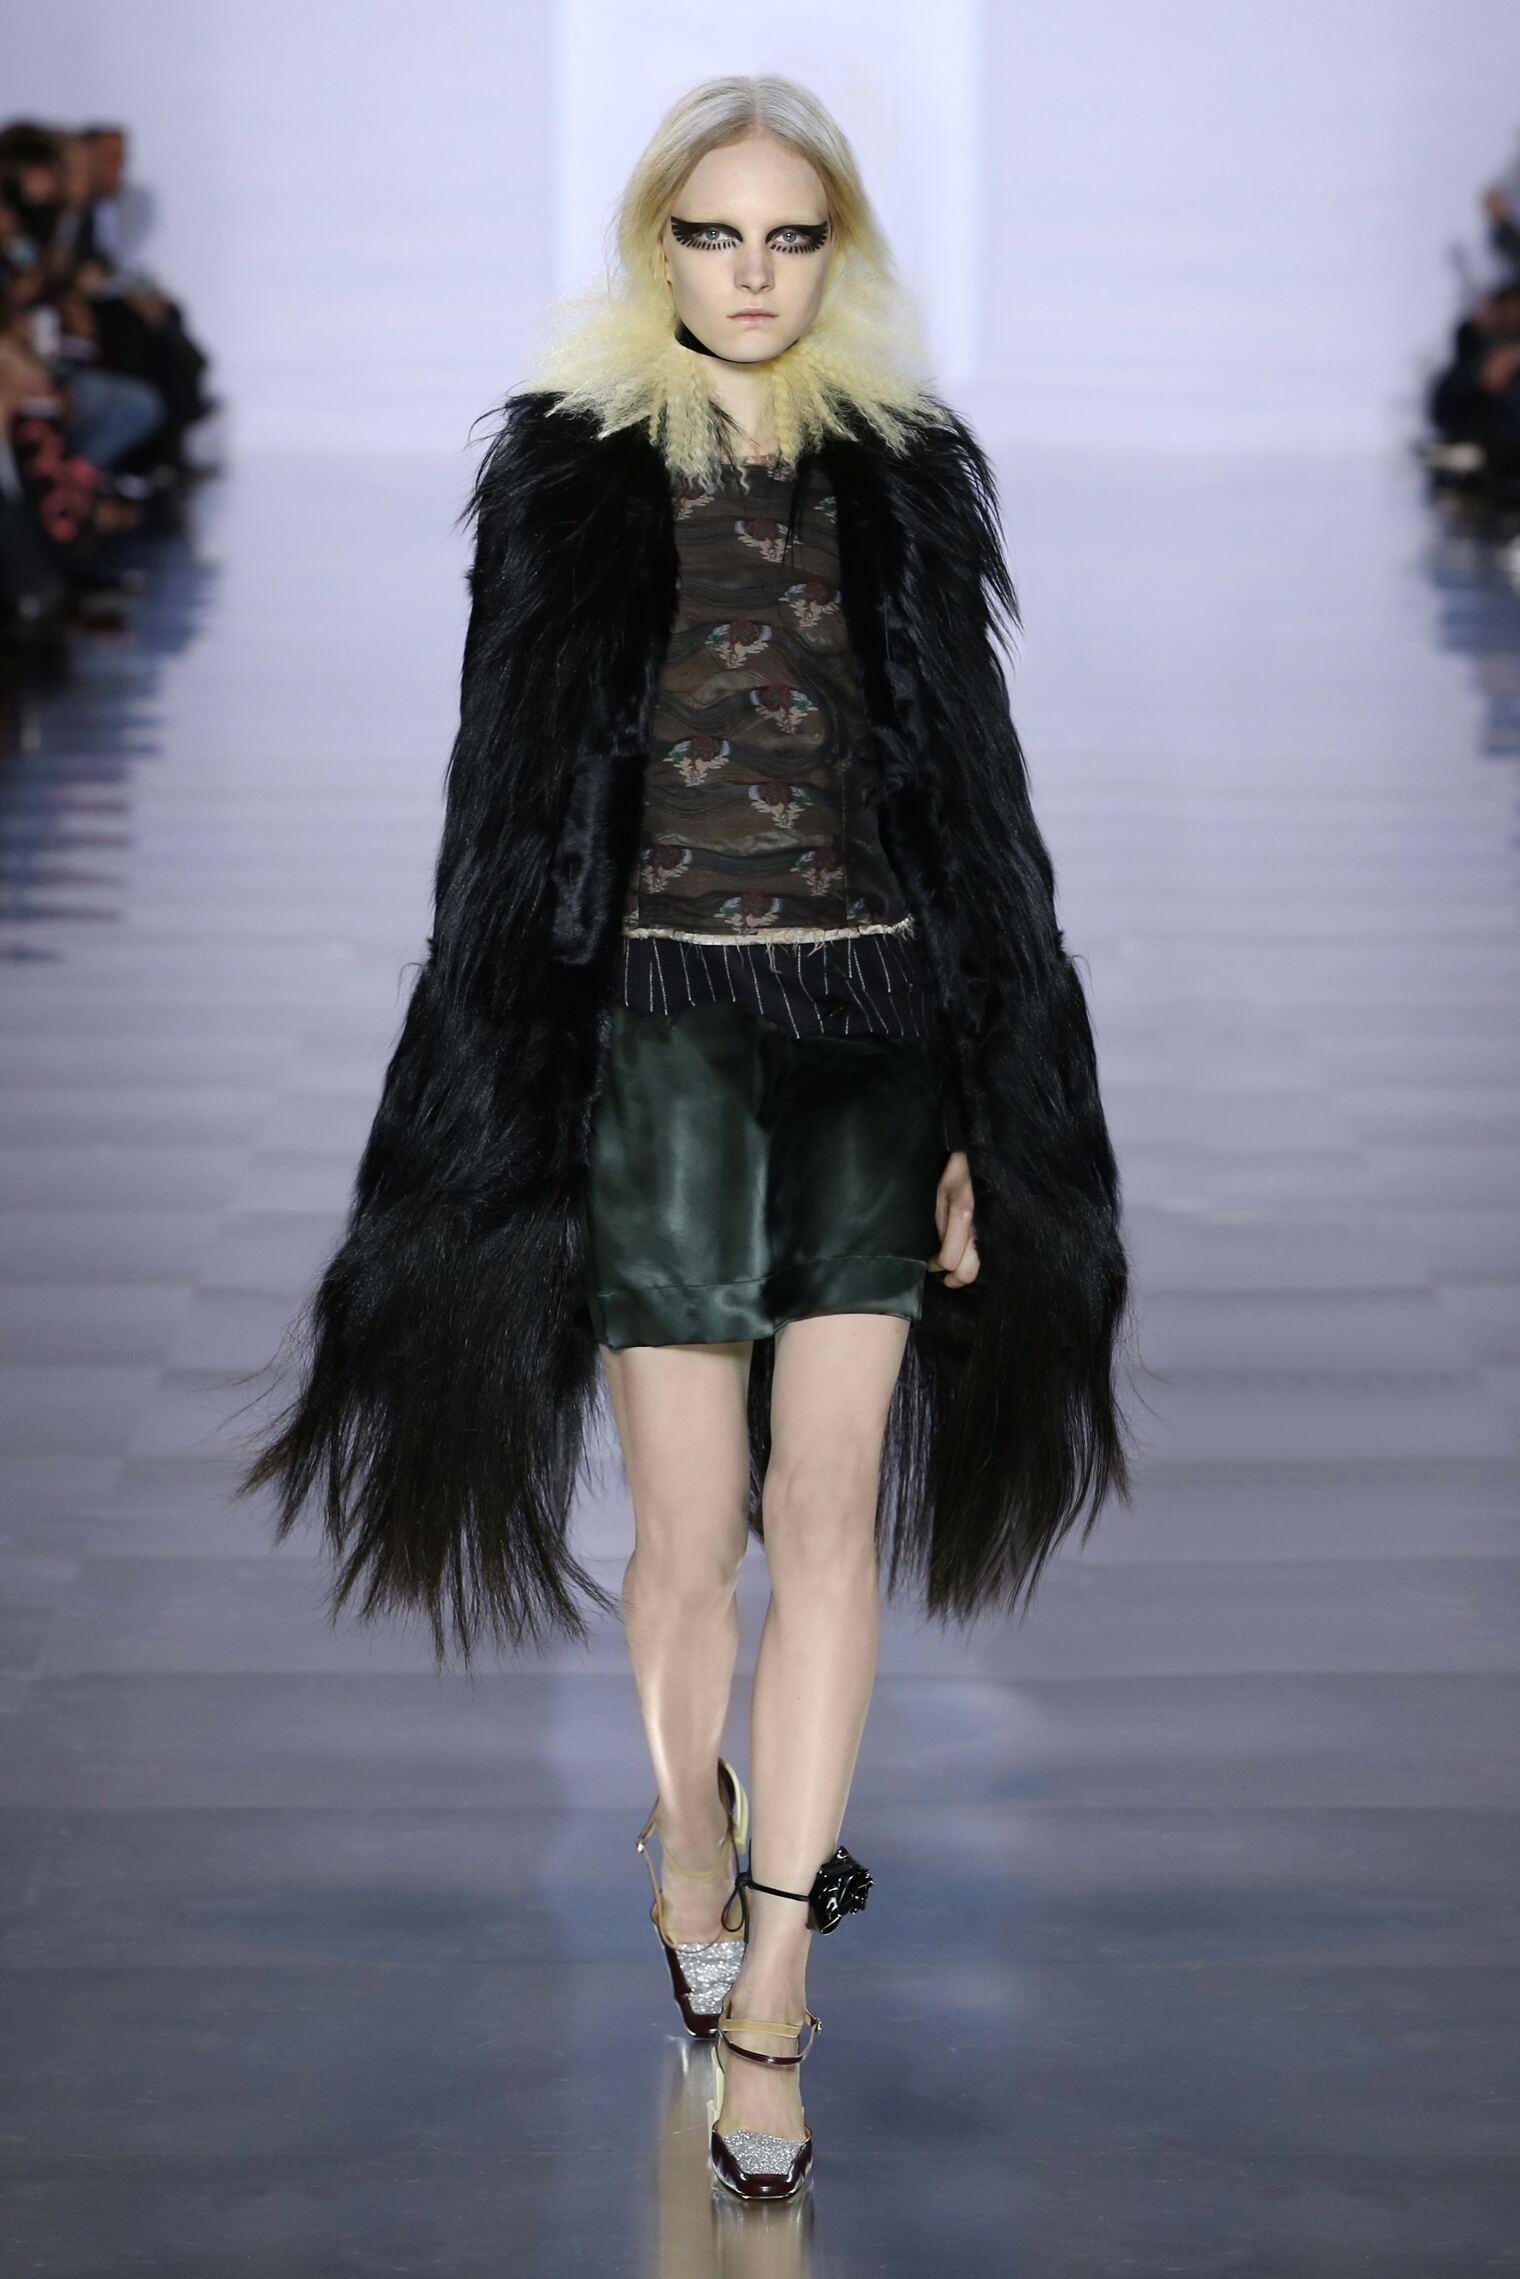 Maison Margiela Fall Winter 2015 16 Womenswear Collection Paris Fashion Week Fashion Show